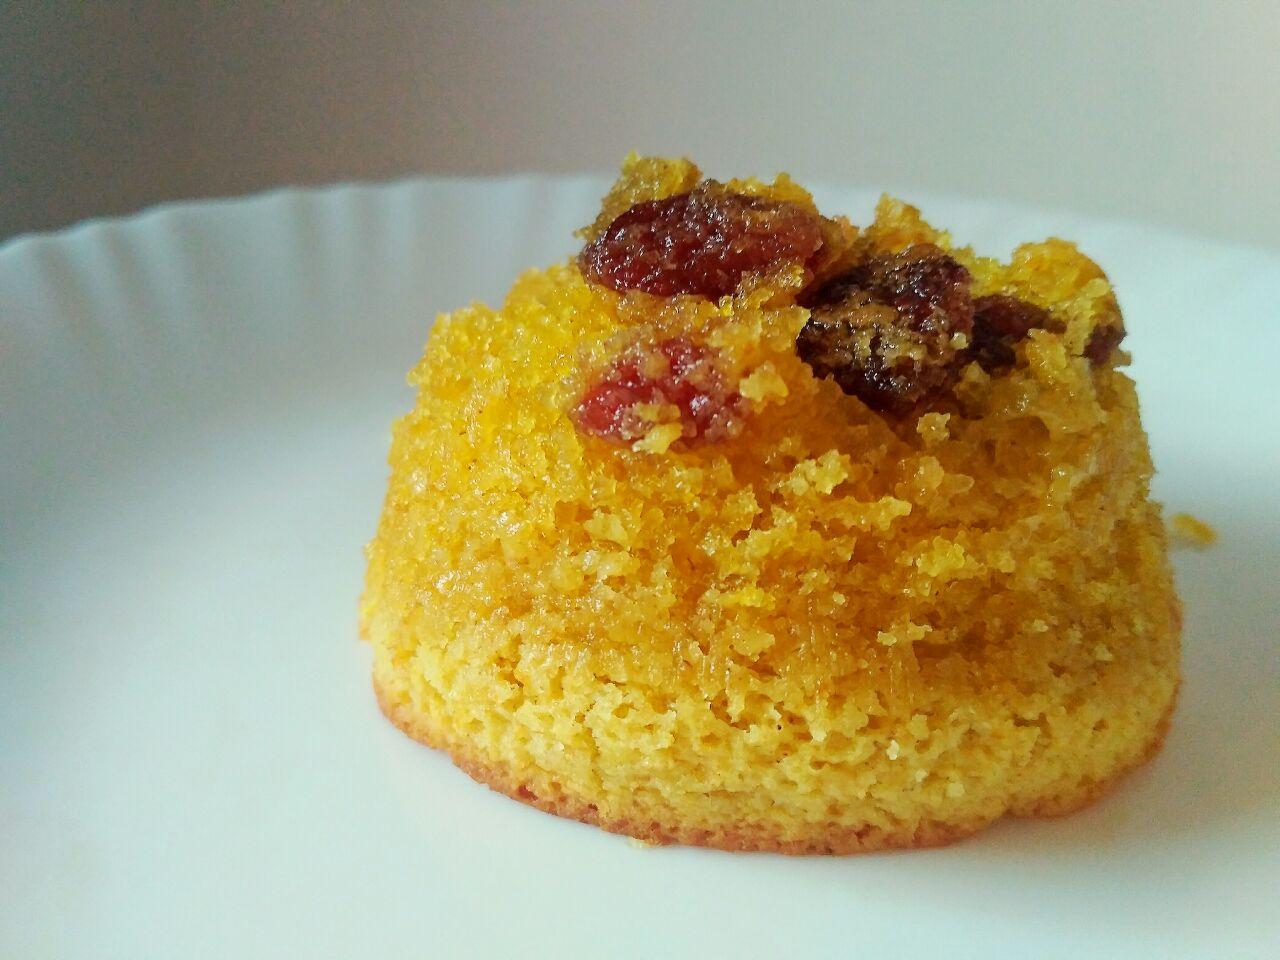 Dolci leggeri: muffin all'arancia vegani, senza uova e senza latte!